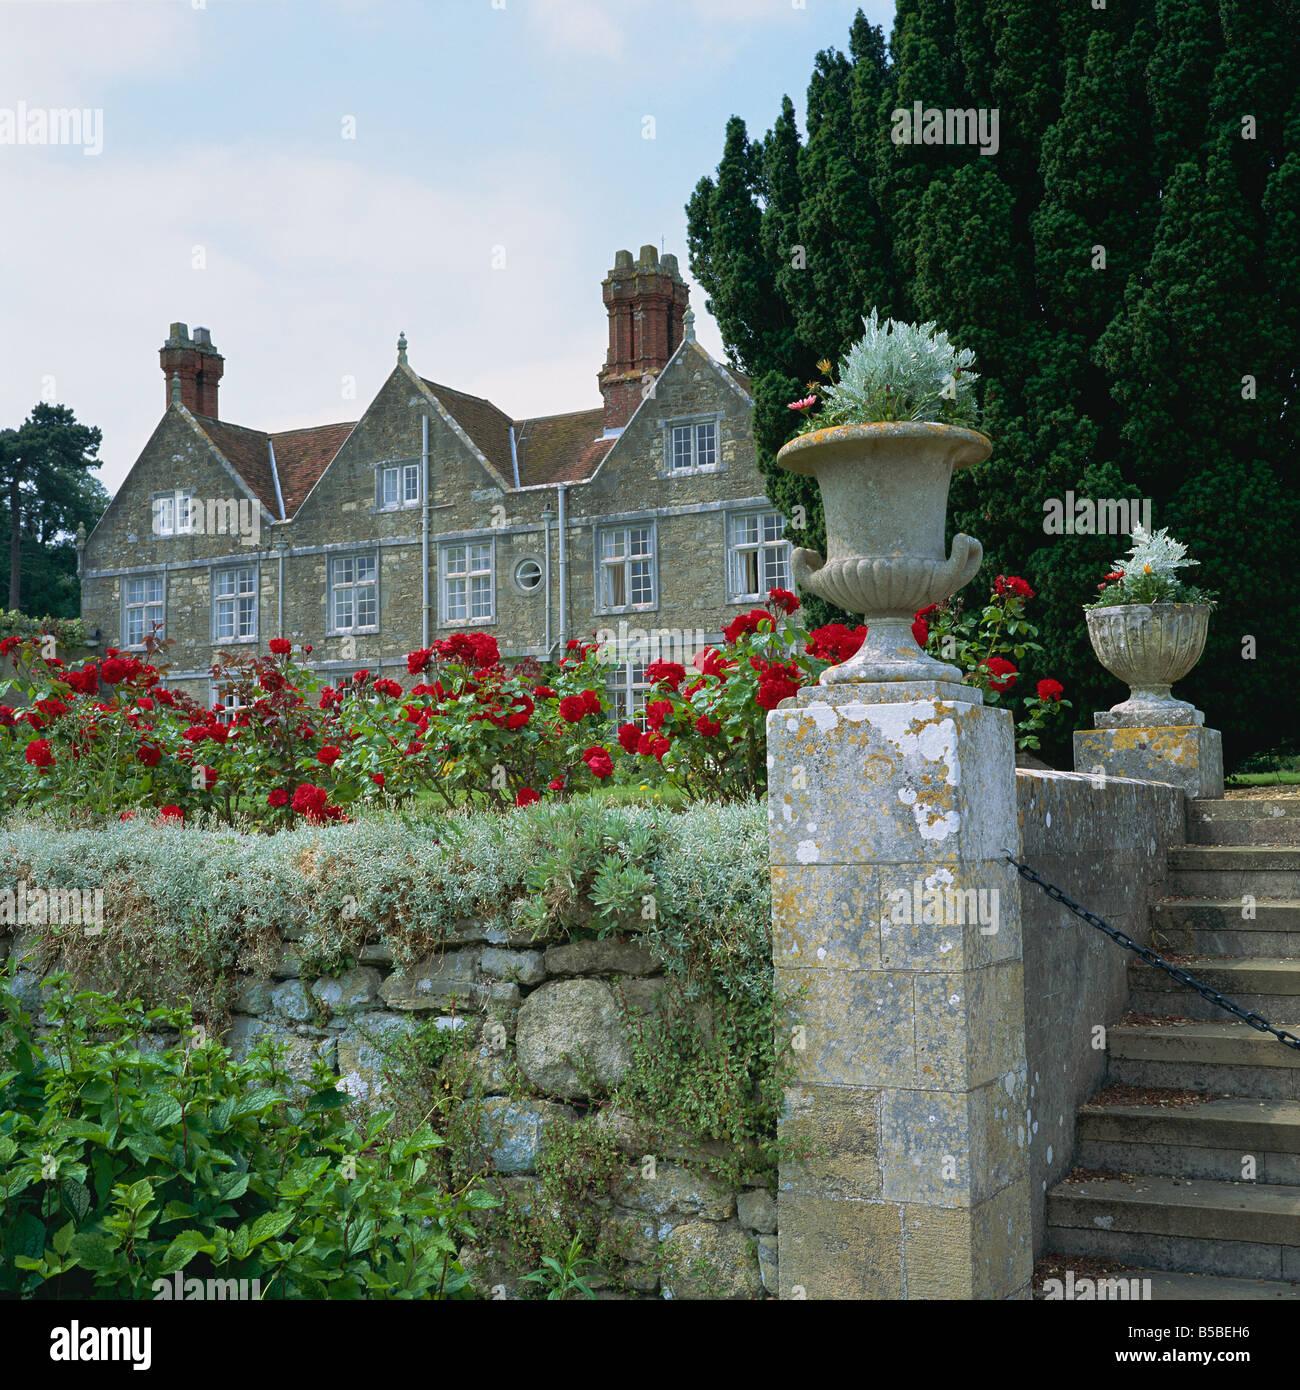 Barton Manor, Isle of Wight, England, Europe - Stock Image